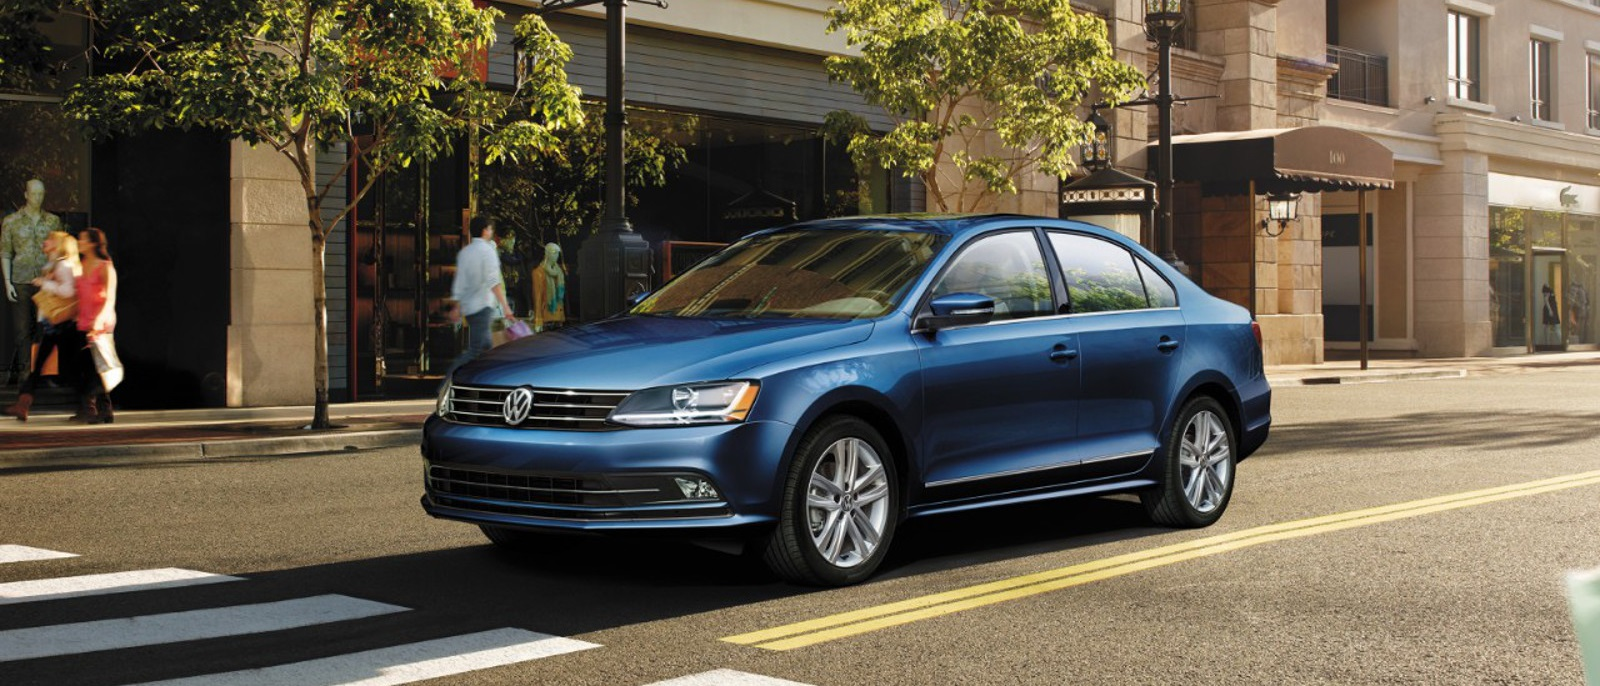 Vw Lookers >> New Volkswagen Vw Deals Finance Offers Lookers | Free HD Wallpapers